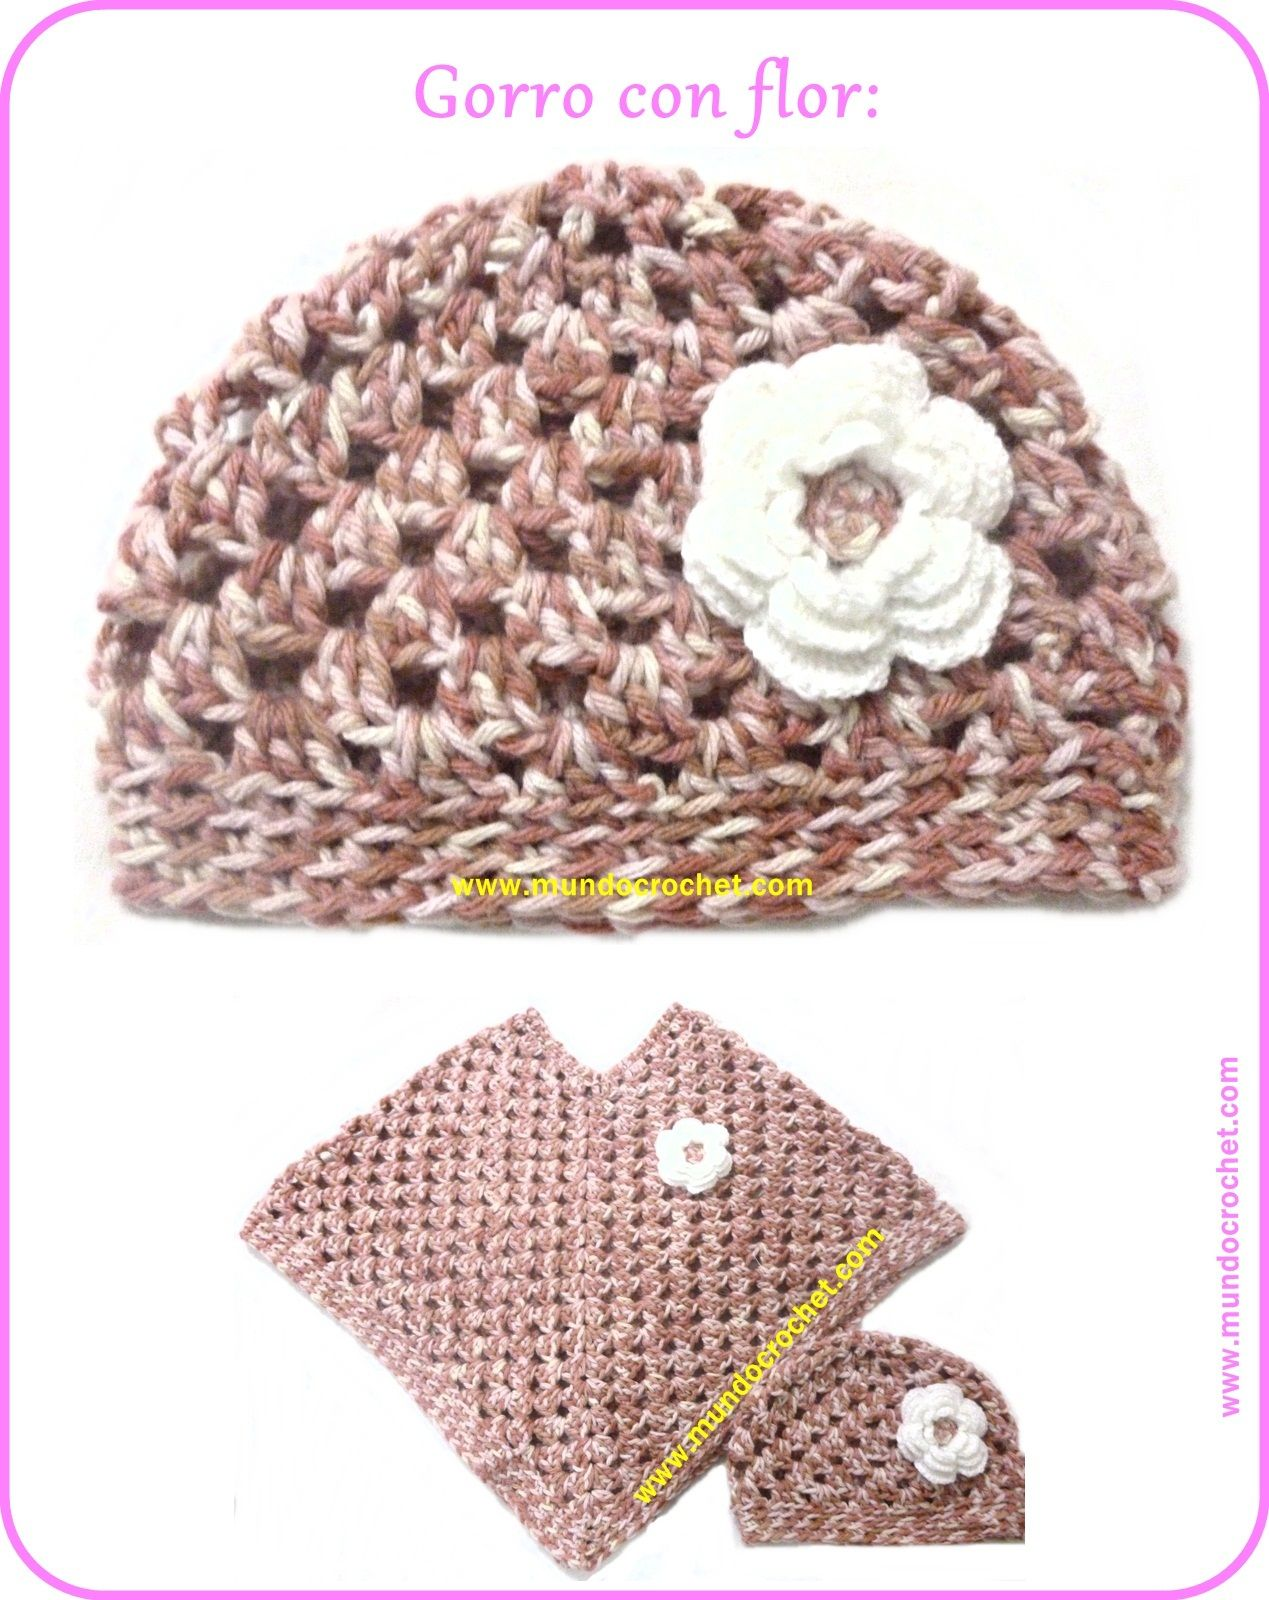 Gorro crochet | Ganchillo Para Bebés | Pinterest | Flor, Ganchillo y ...